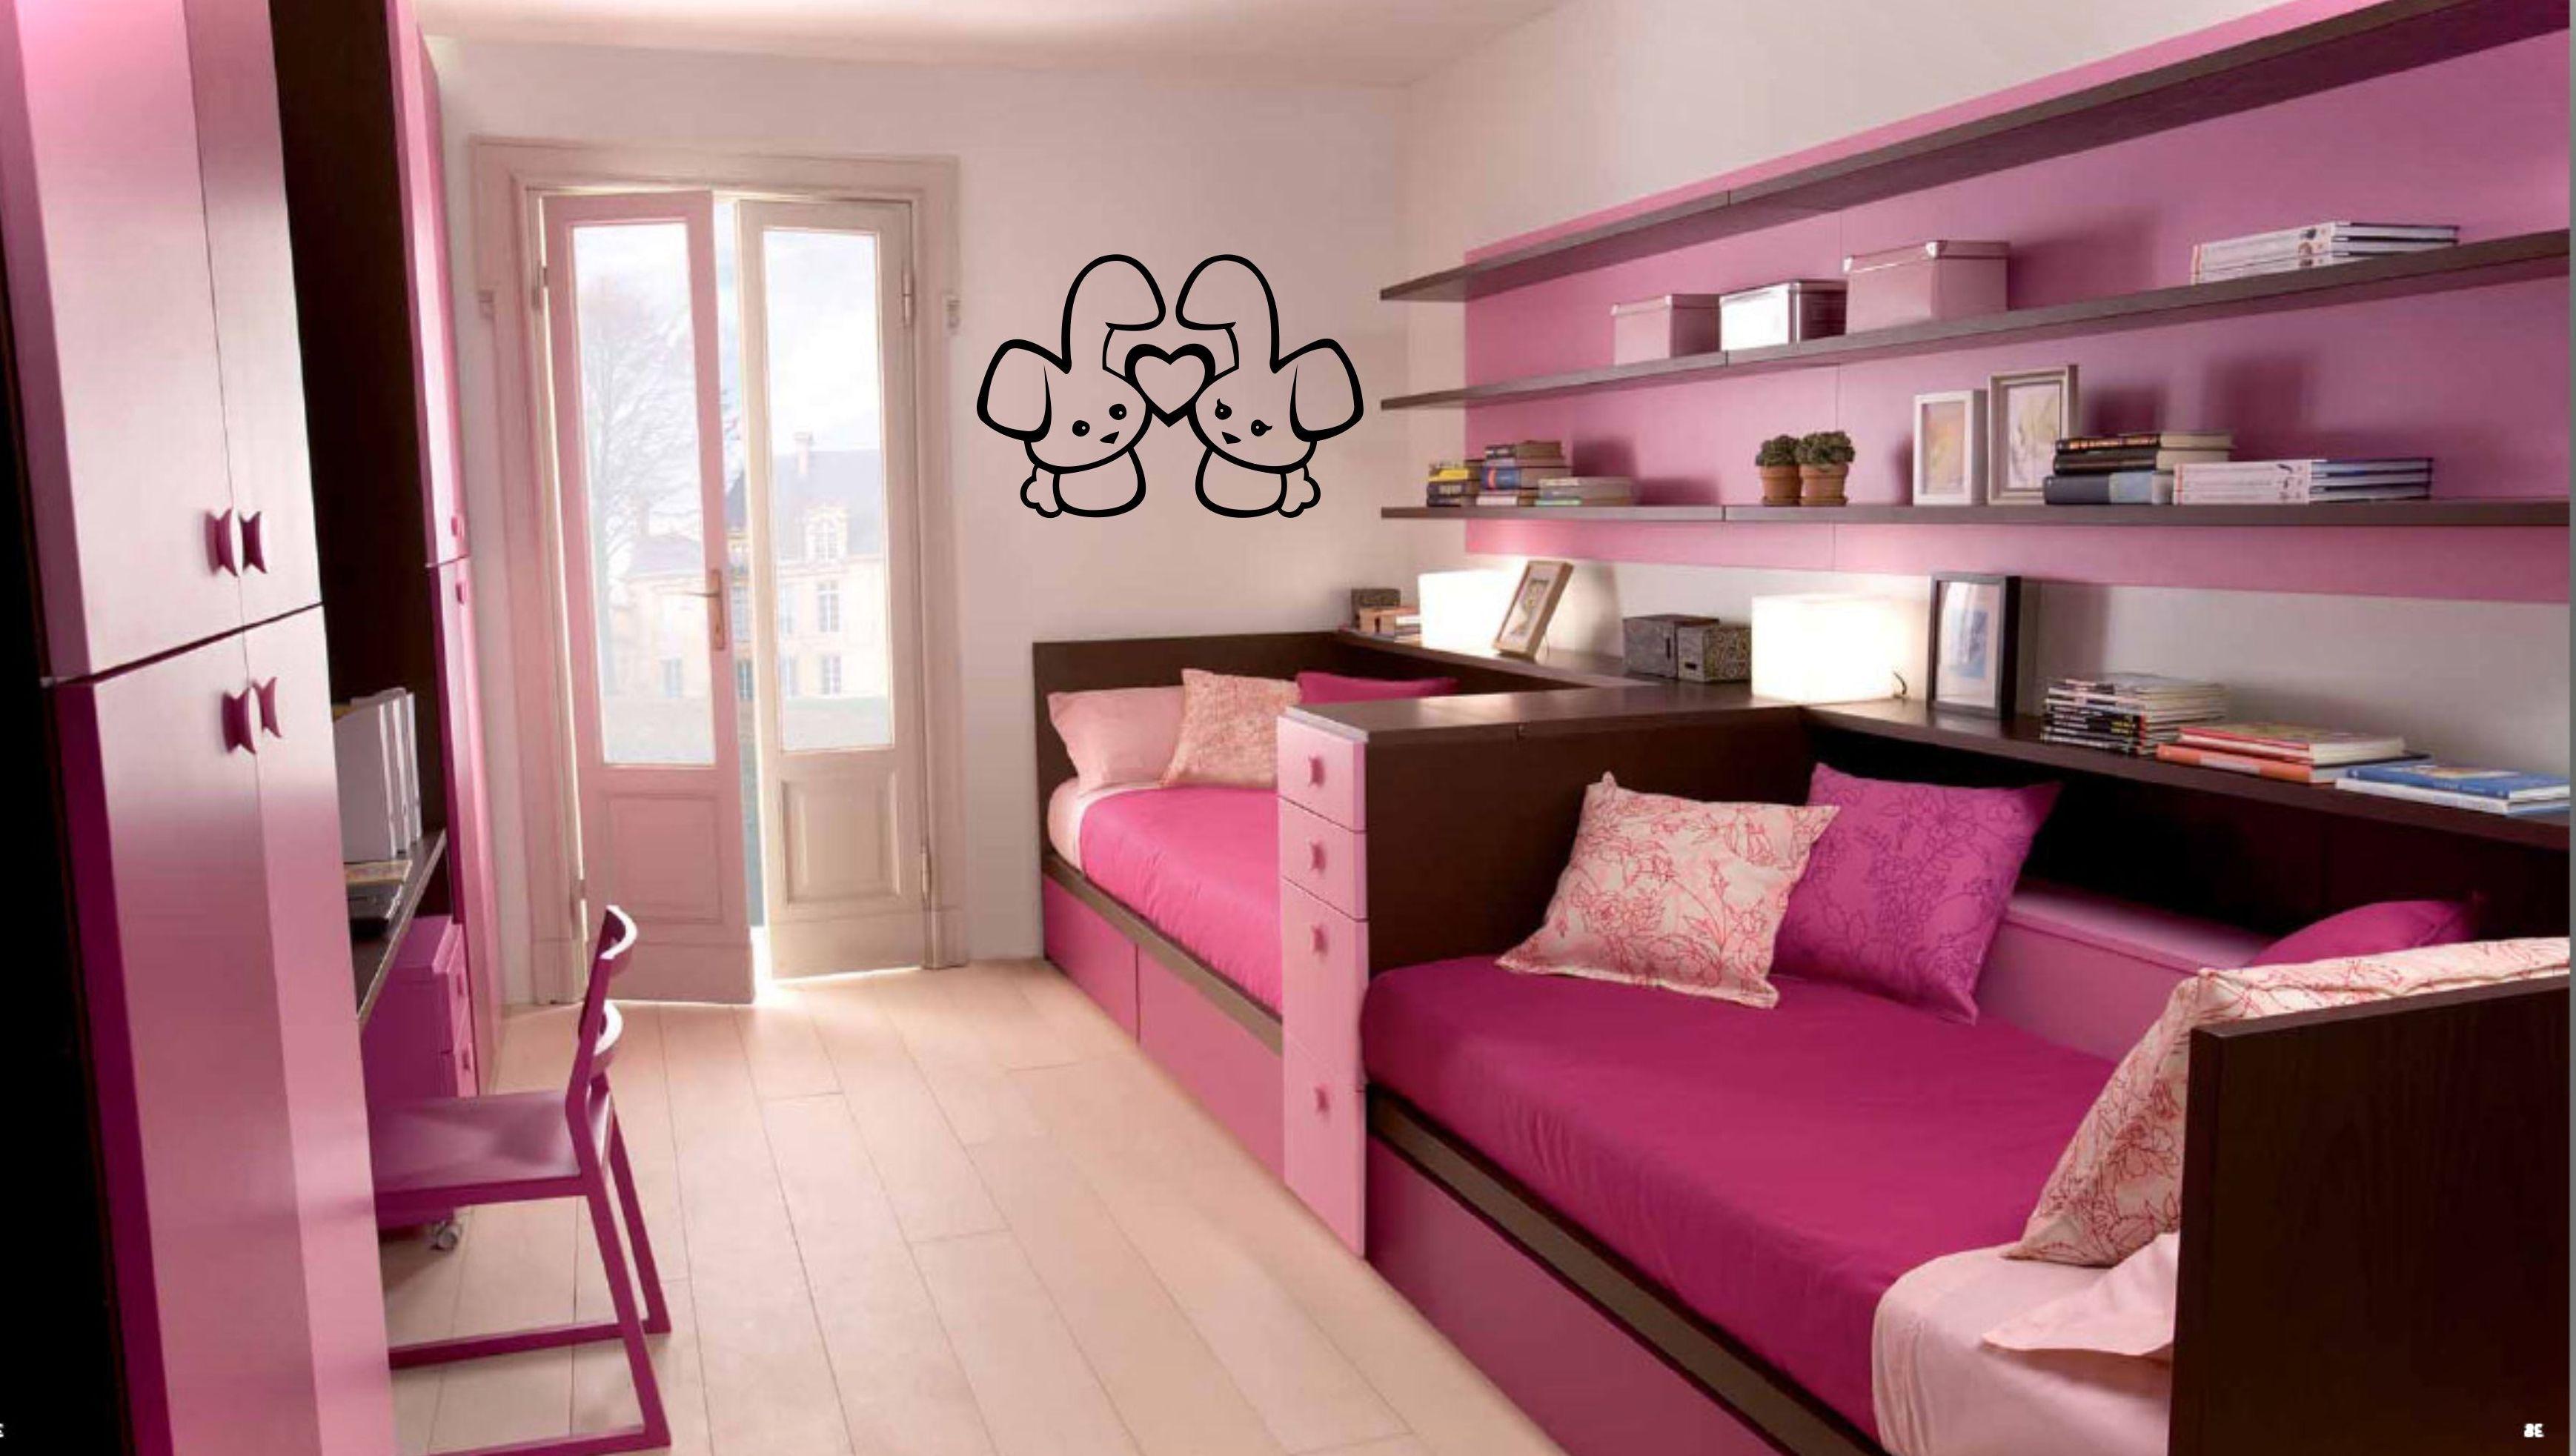 Bedrooms Designs For Girls Bedroom Apply Beautiful Bedroom Designs Teenage Girls With Modern